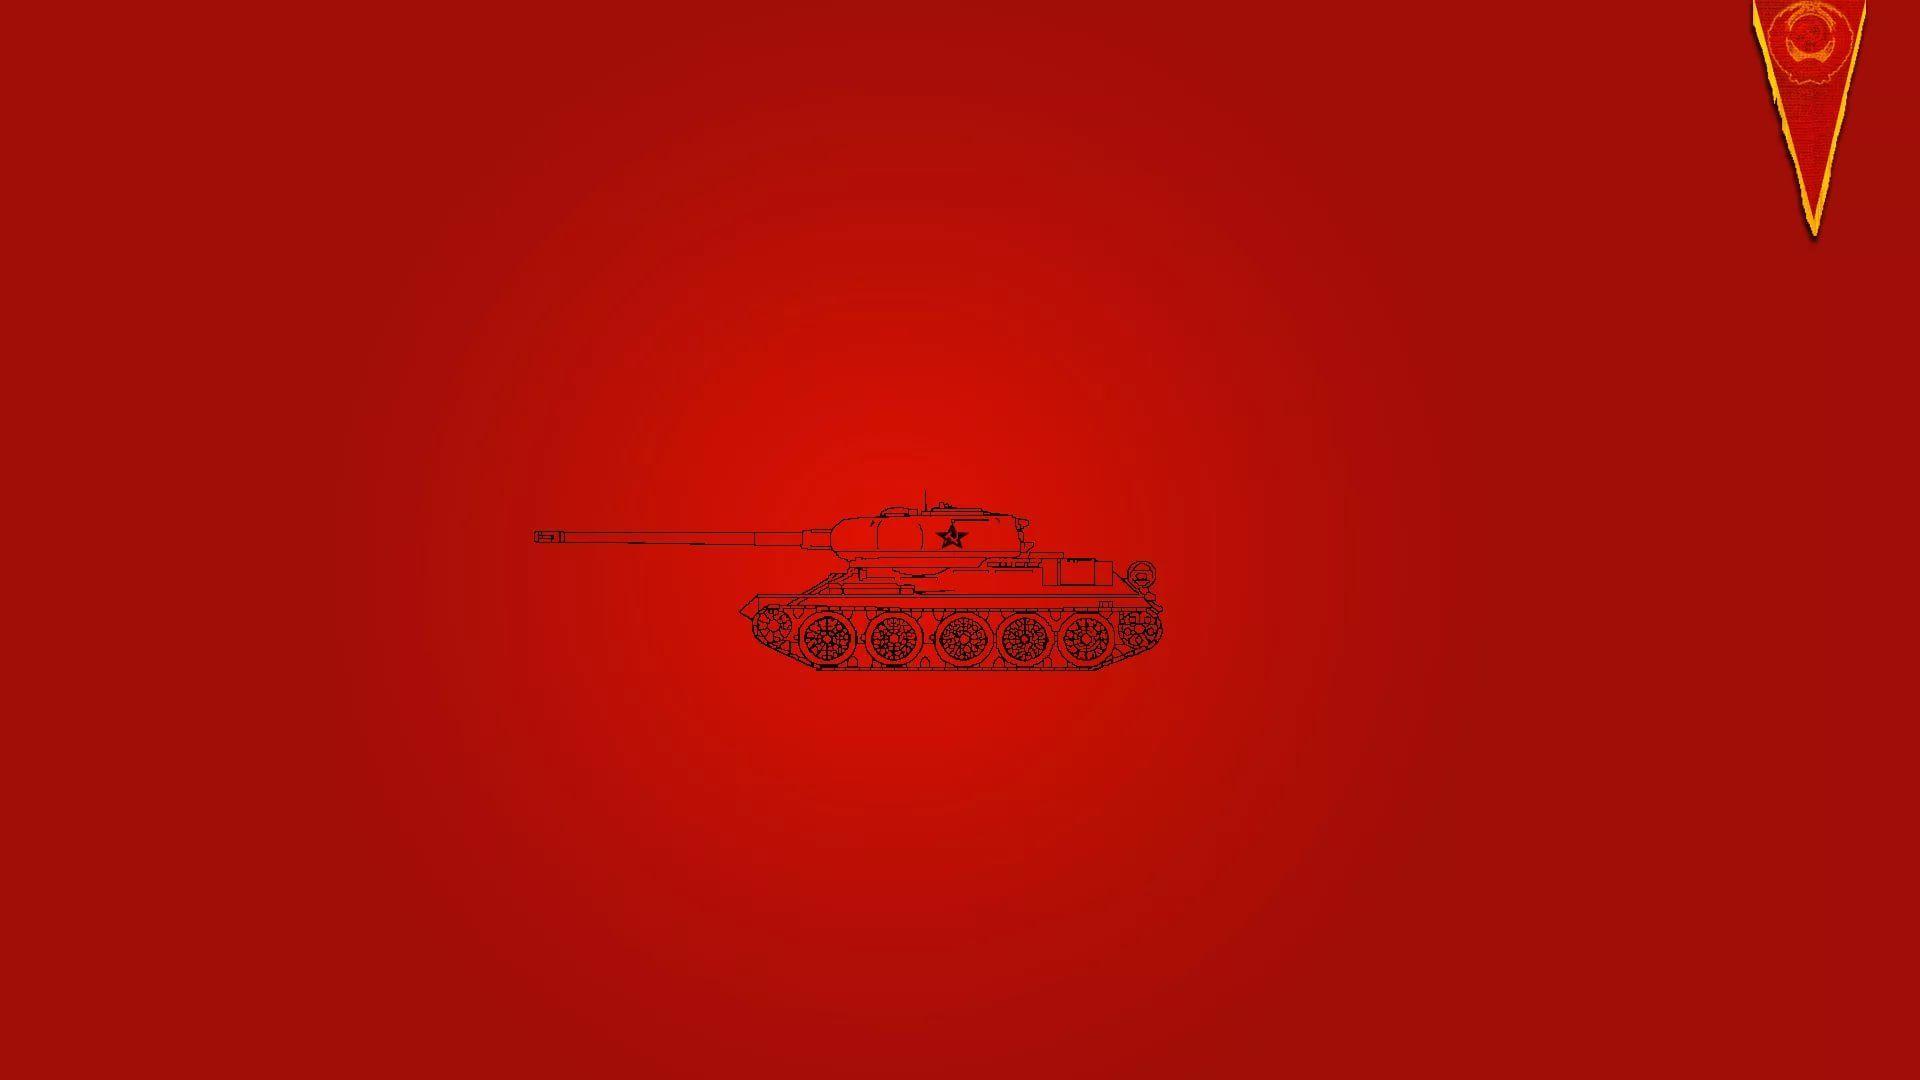 Communism download wallpaper image